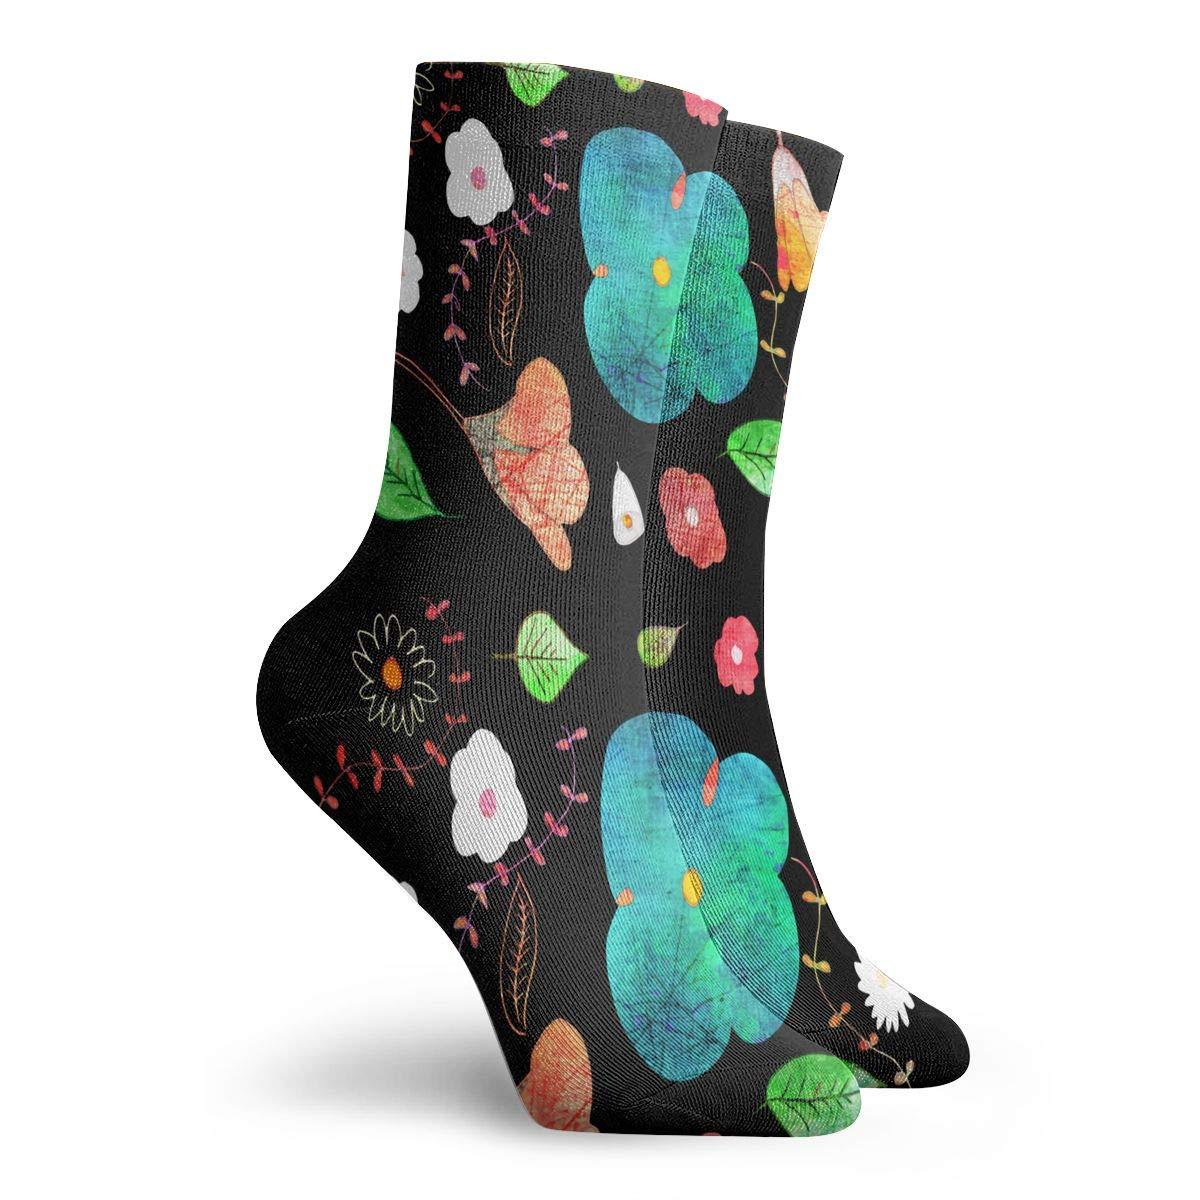 Japanese Midnight Garden Fashion Dress Socks Short Socks Leisure Travel 11.8 Inch